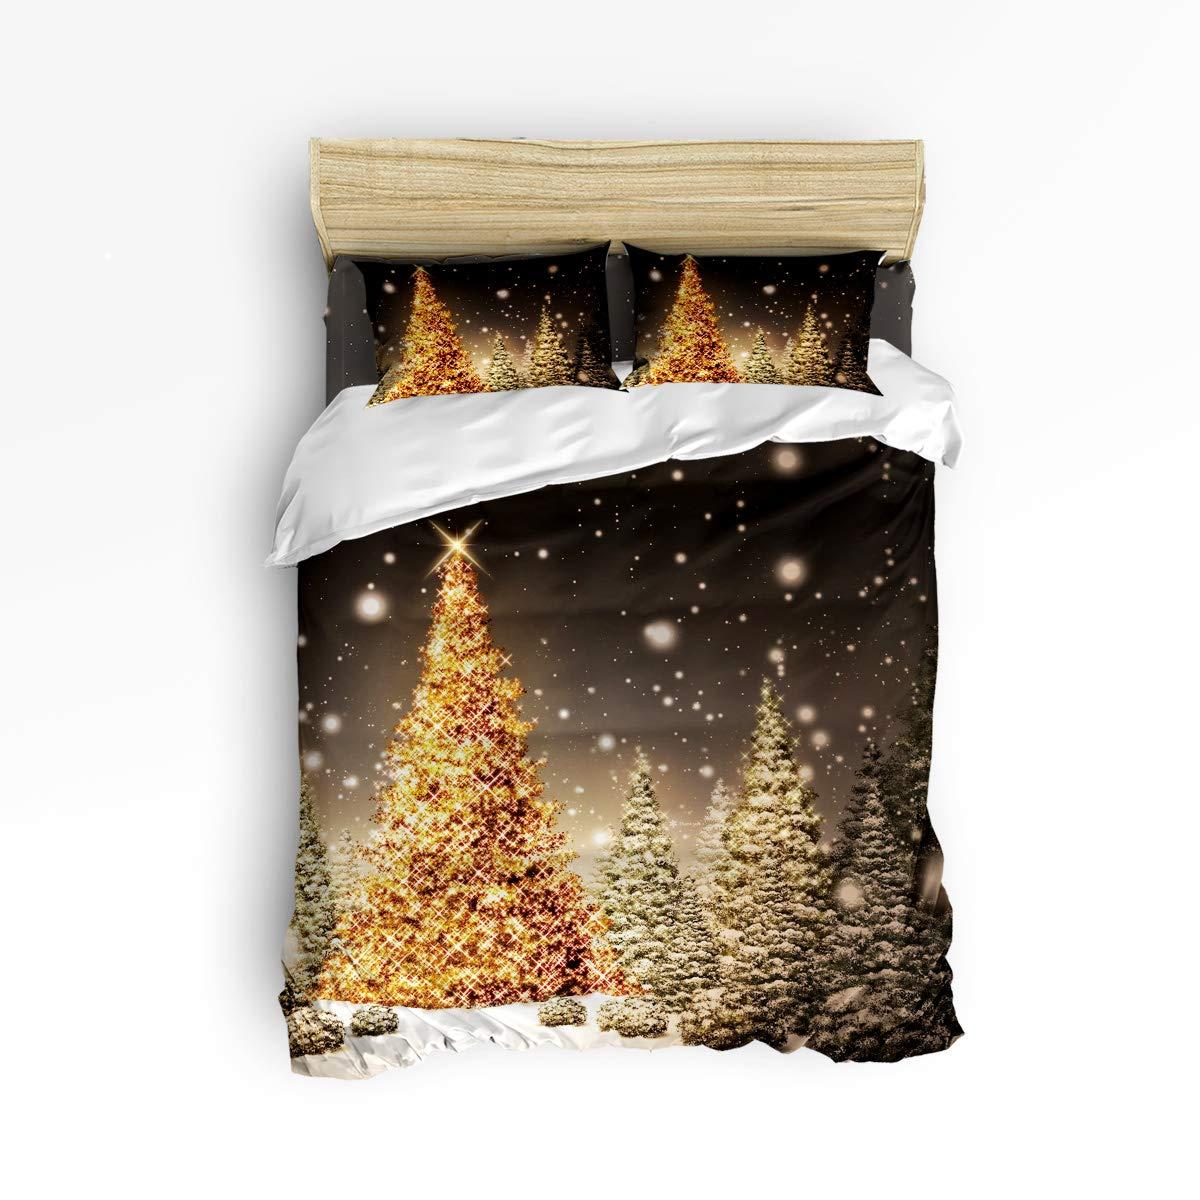 Plelat ソフト寝具4点セット 布団カバーセット 子供用 かわいい猫 動物柄 ベッドシーツセット 掛け布団カバー1枚 フラットシーツ1枚 枕カバー2枚 ツイン 20181122WHLPLTSJTSJSLXM03703SJTAPLT B07KS7RHTF Christmas 2452lplt4238 ツイン